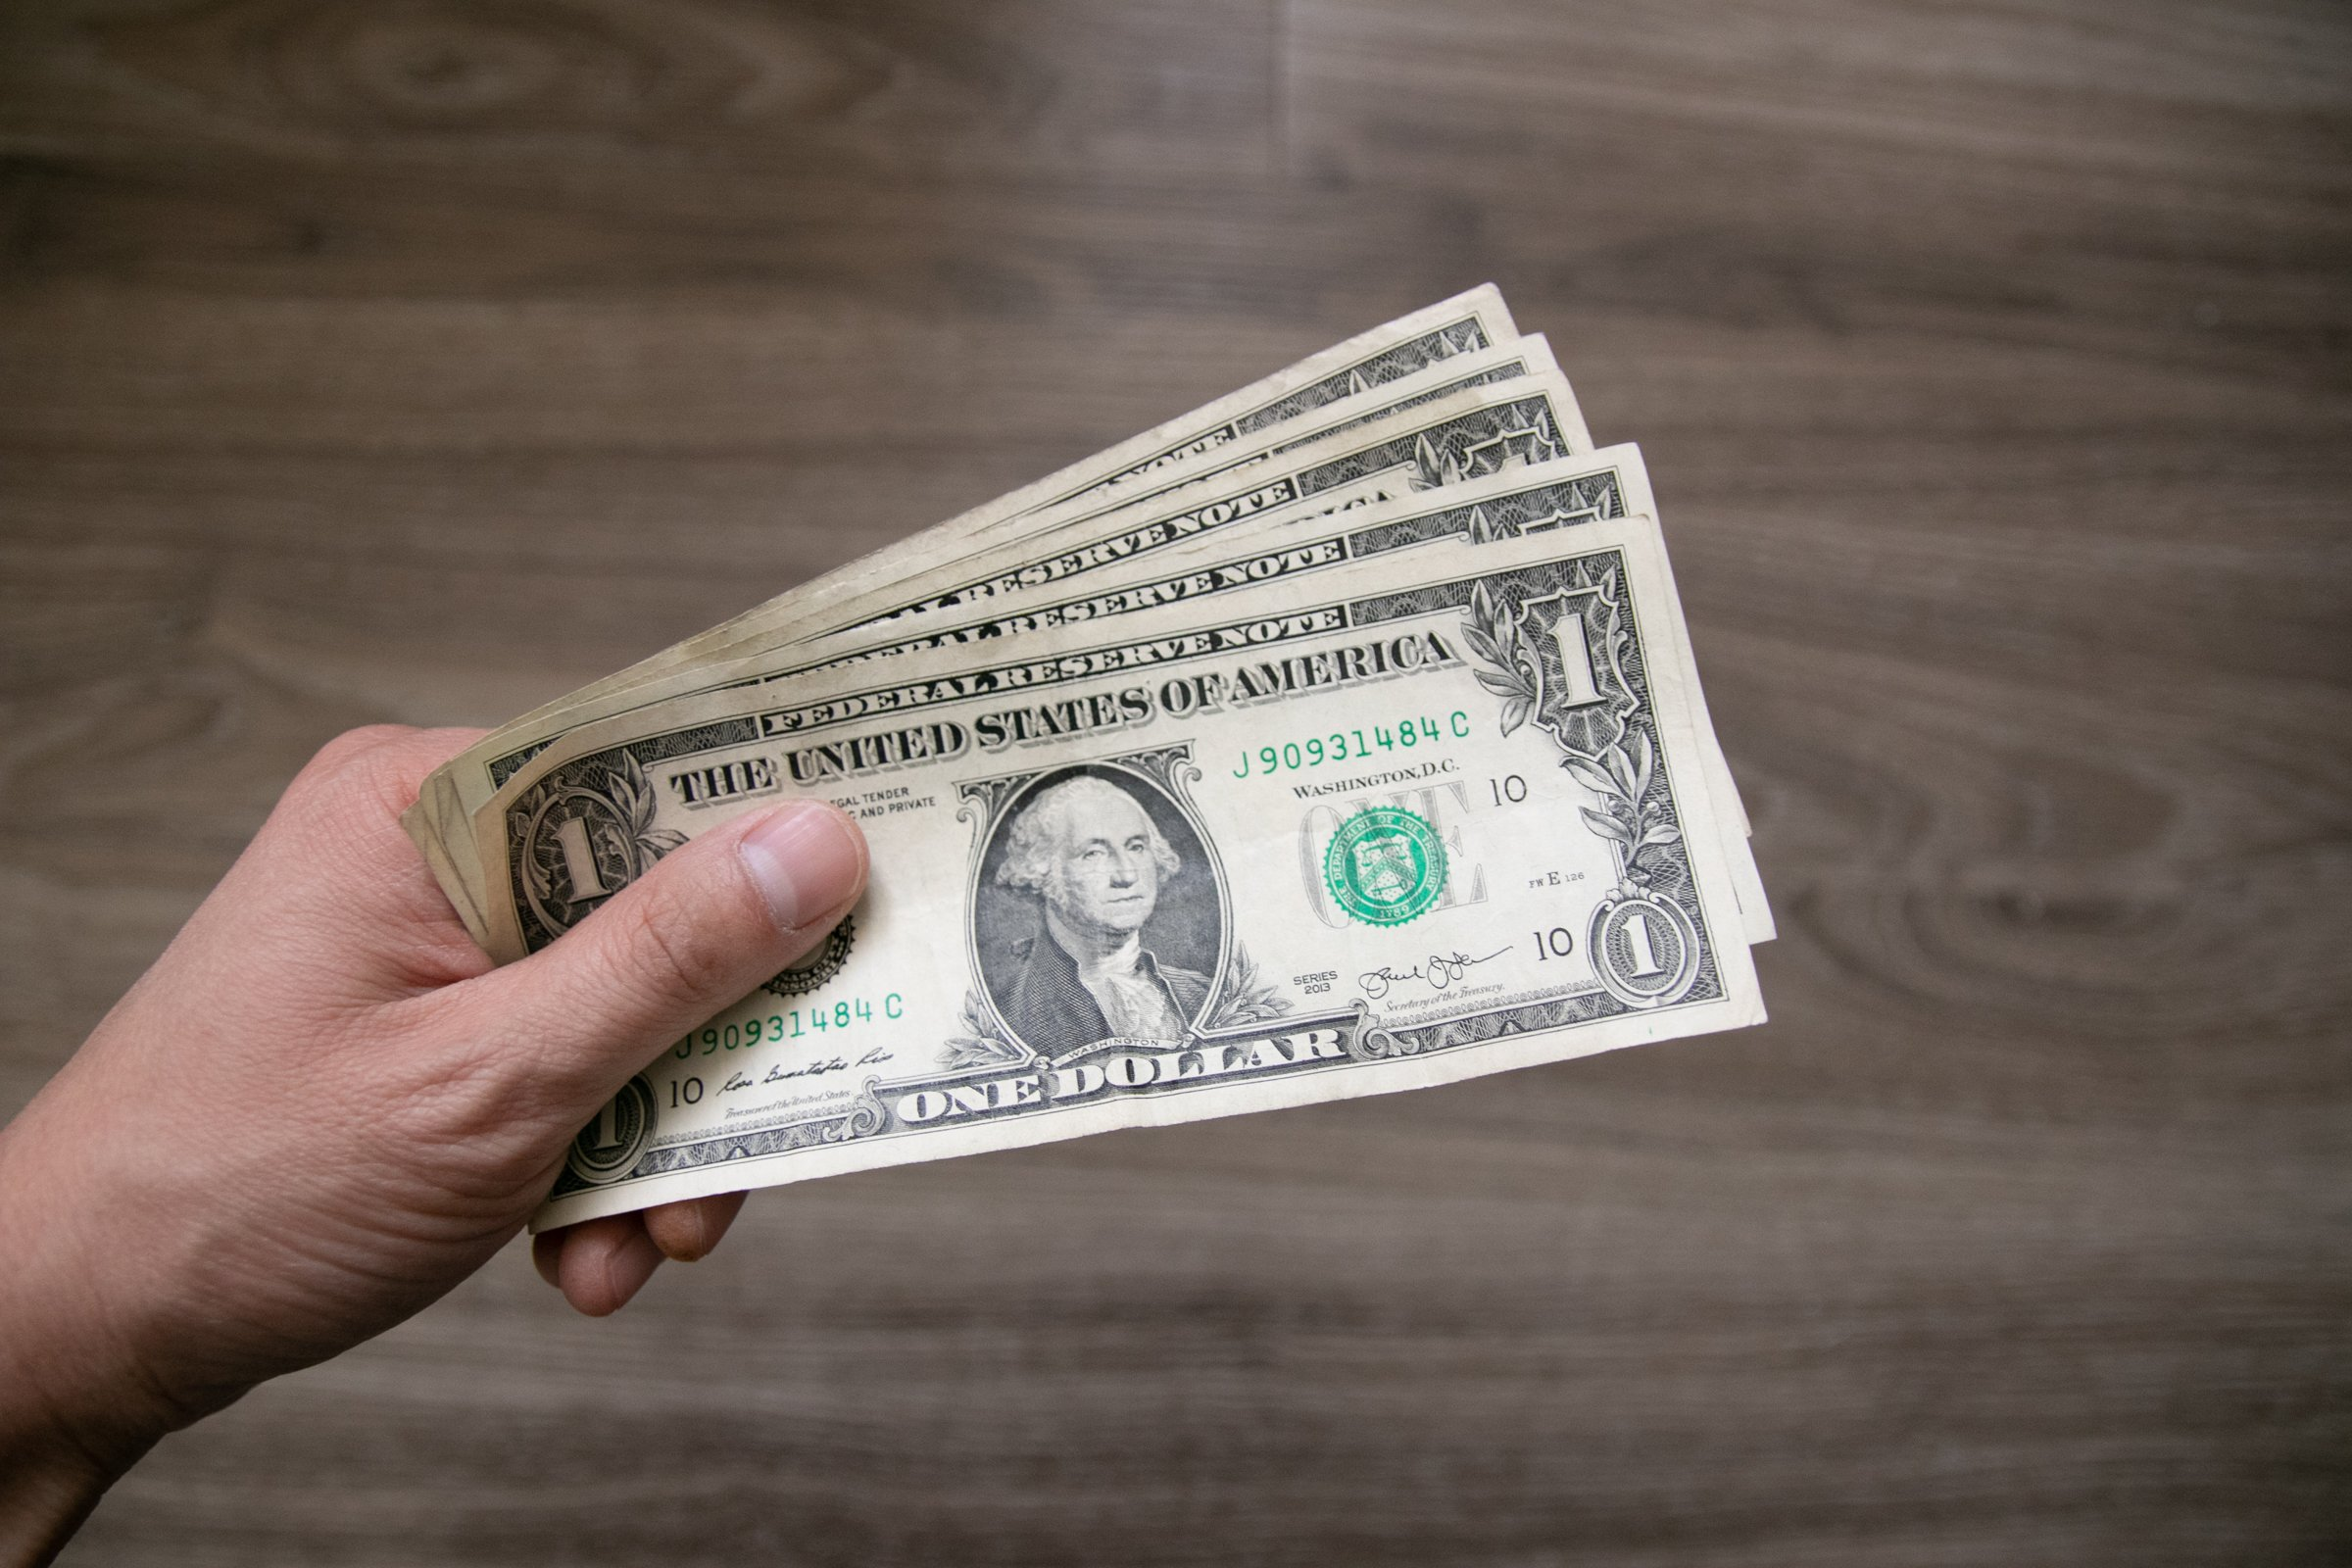 Left Hand Holding One Dollar Bills